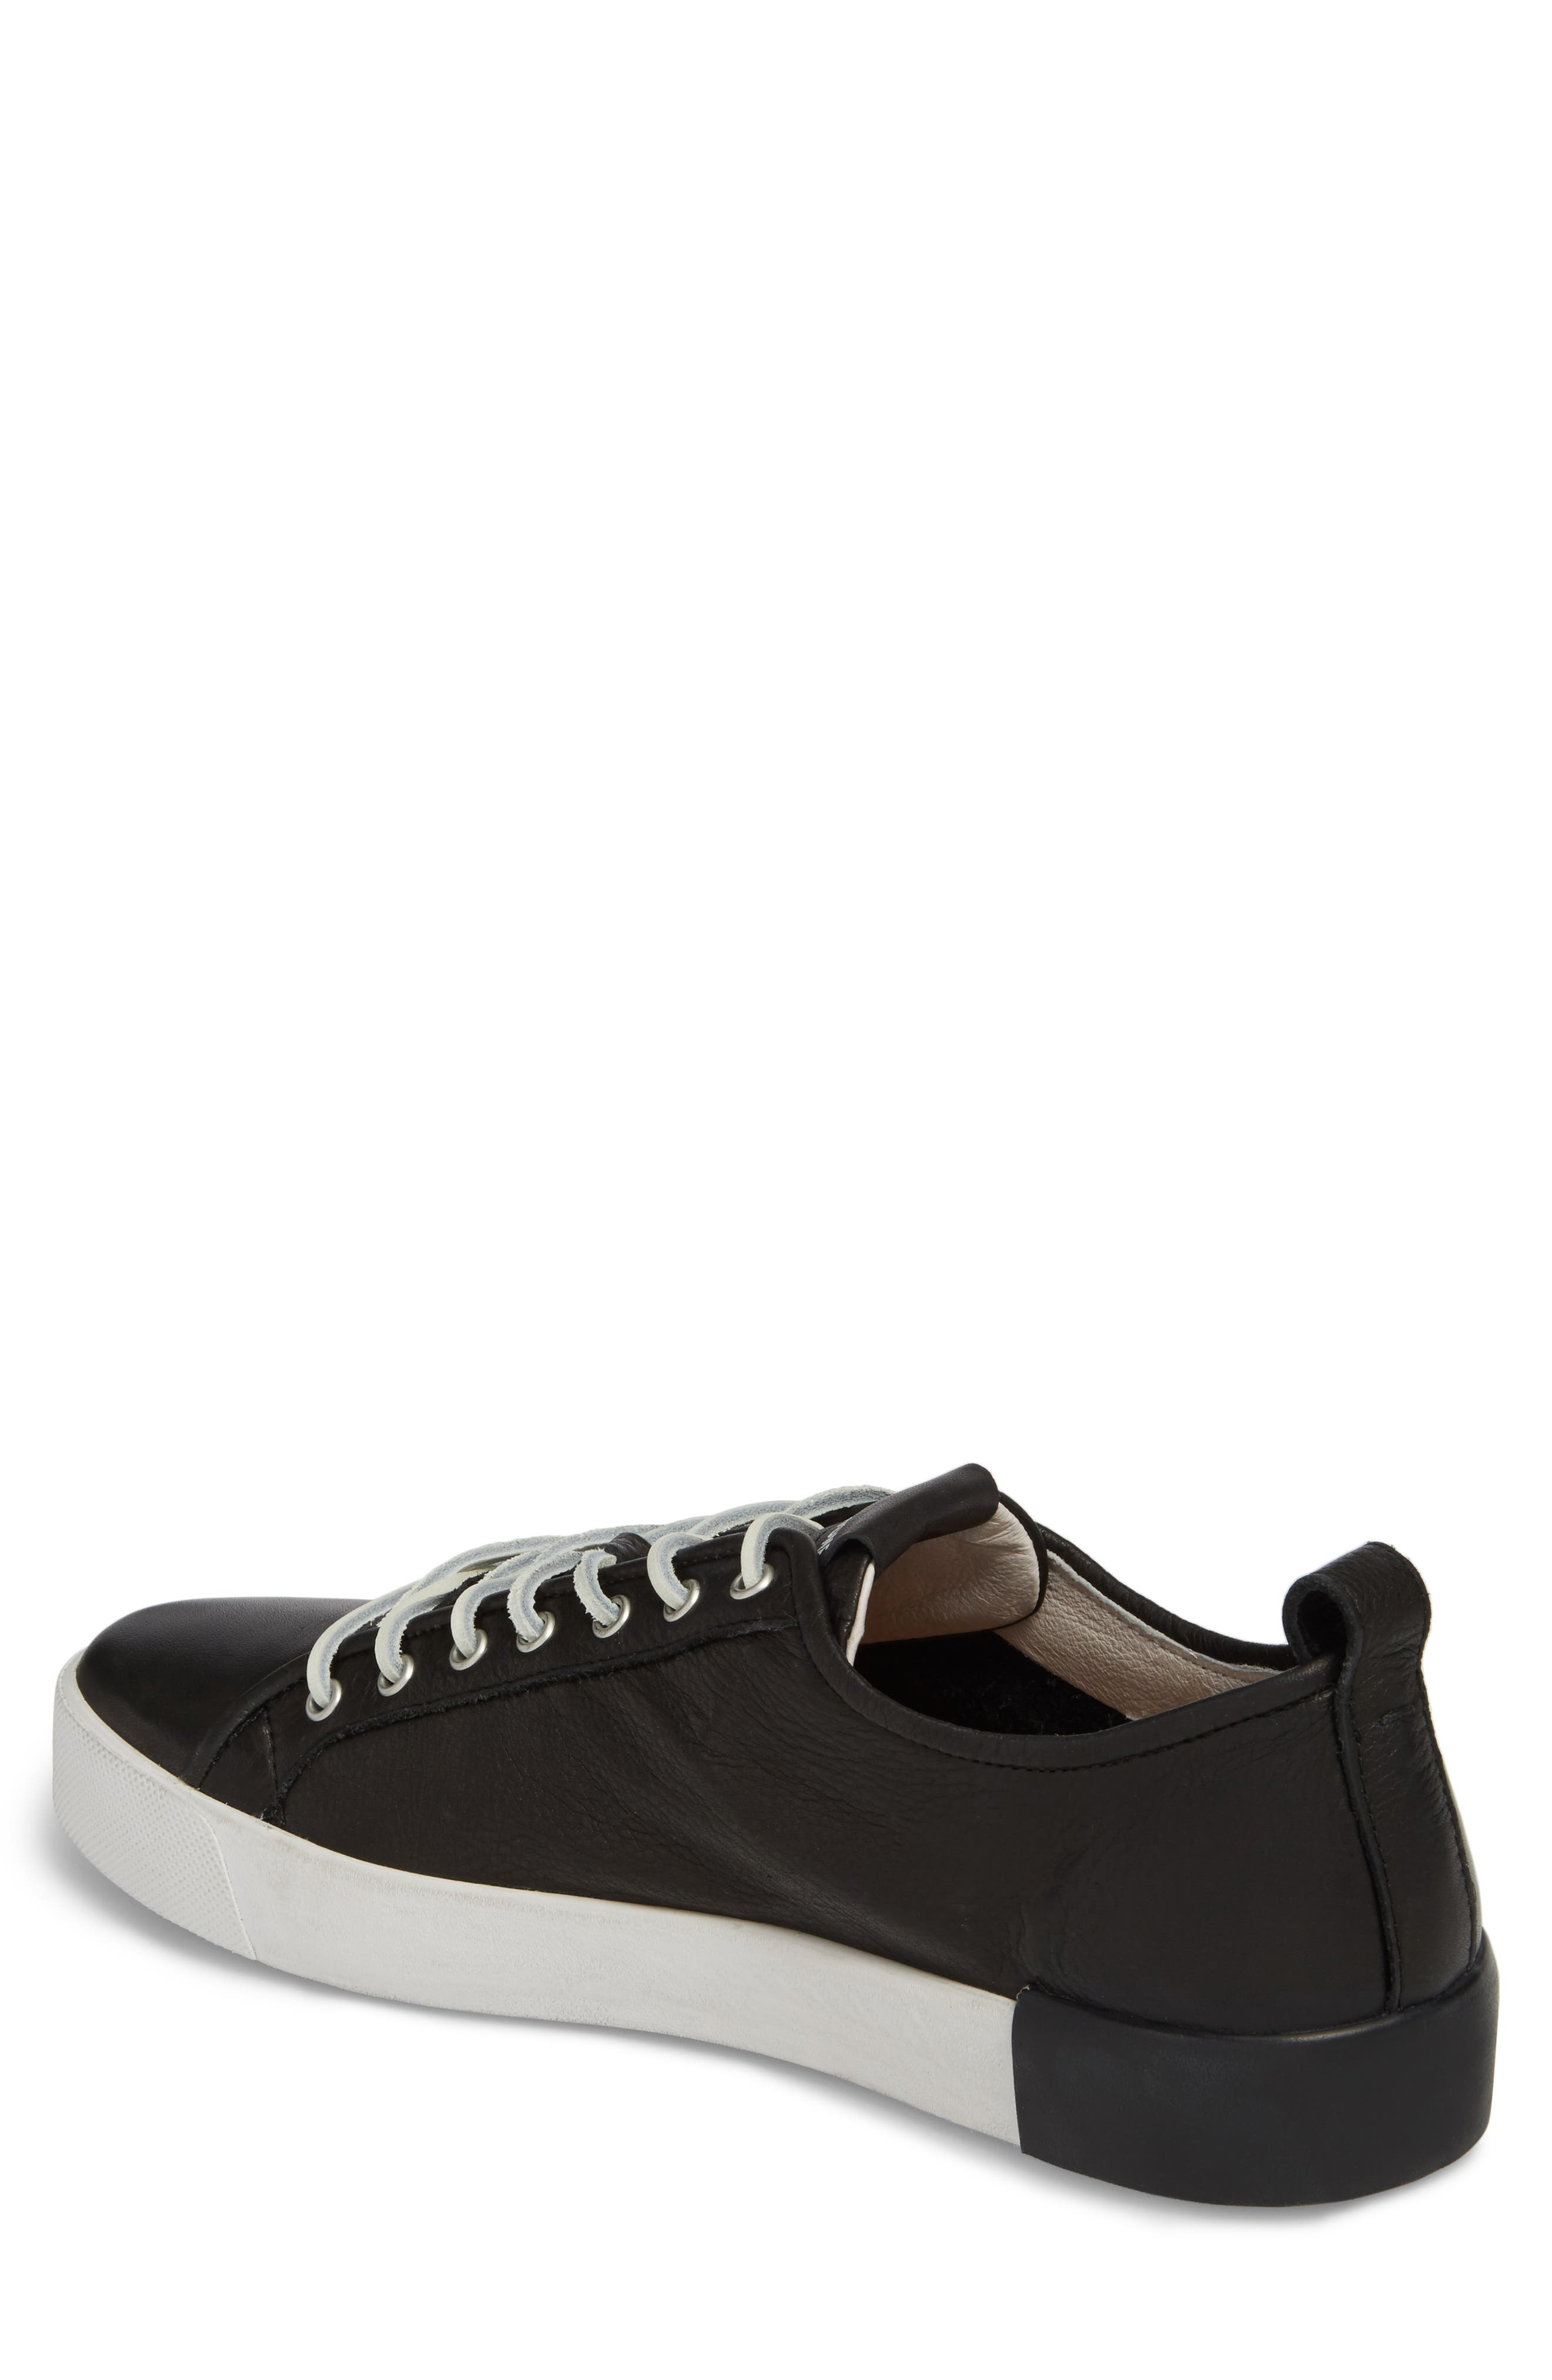 PM66 Low Top Sneaker,                             Alternate thumbnail 2, color,                             BLACK LEATHER